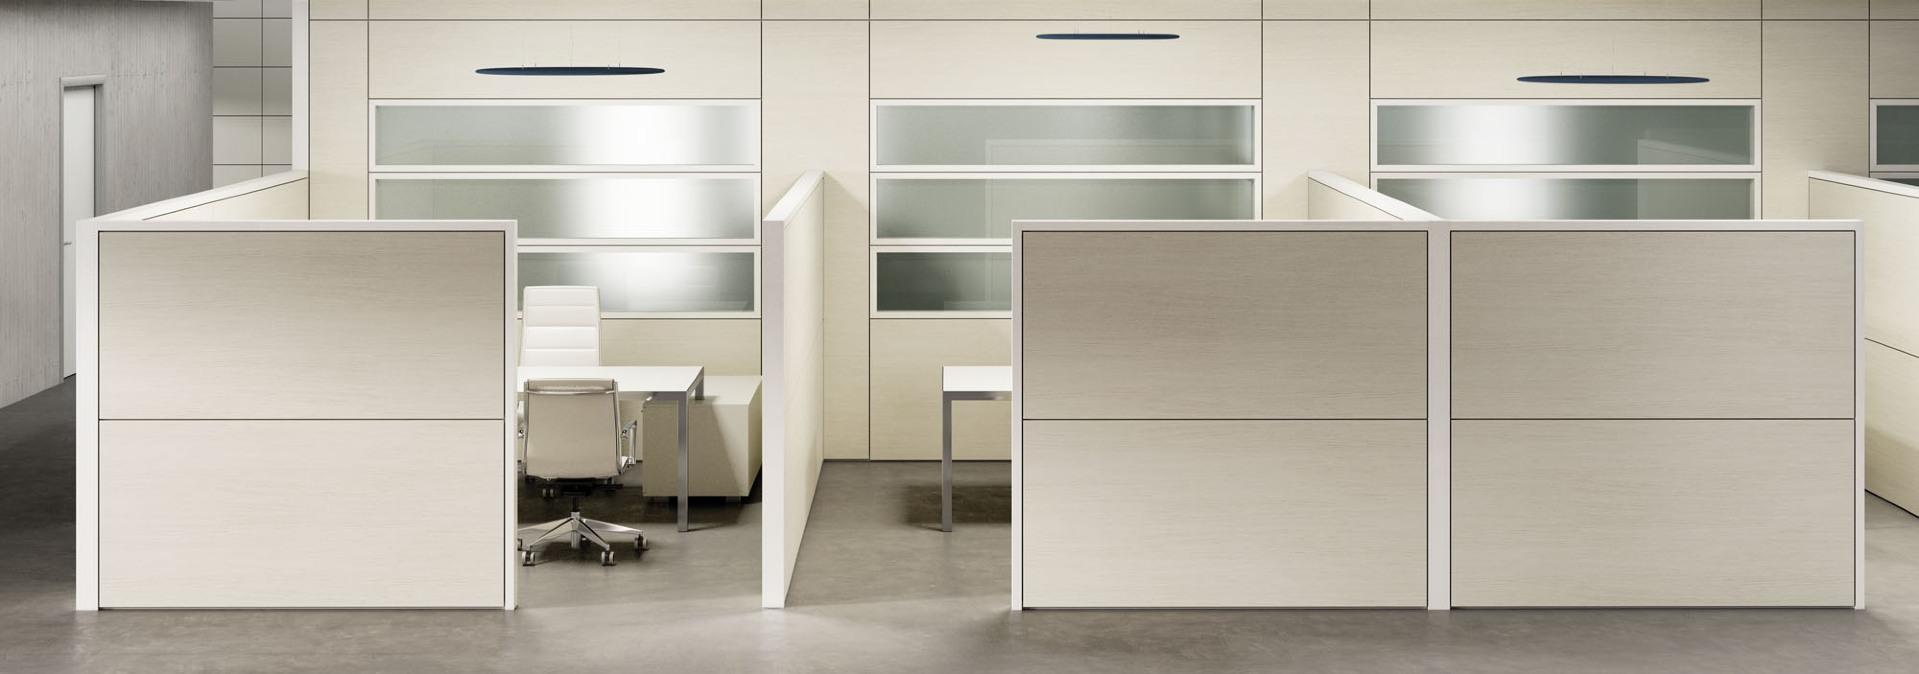 tecna-open-parete-open-space-cubicle.jpg